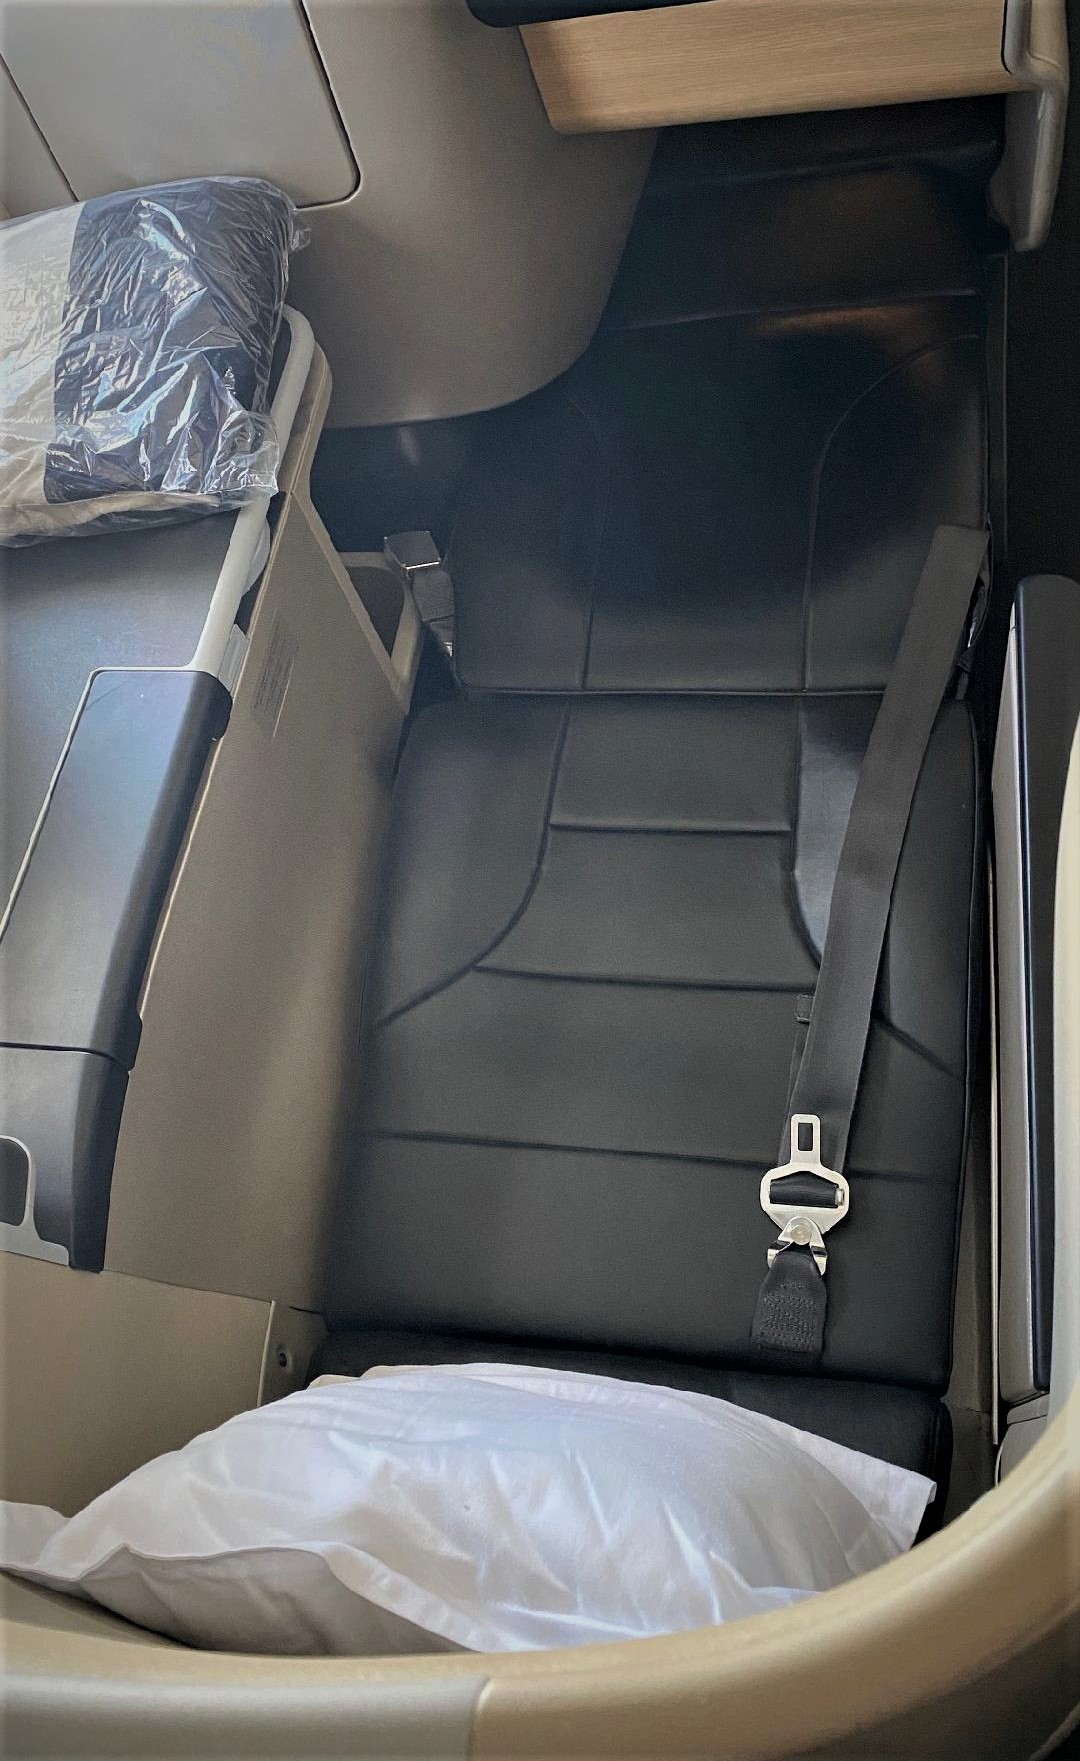 Qantas A-330 Business Class Seat, Bed mode